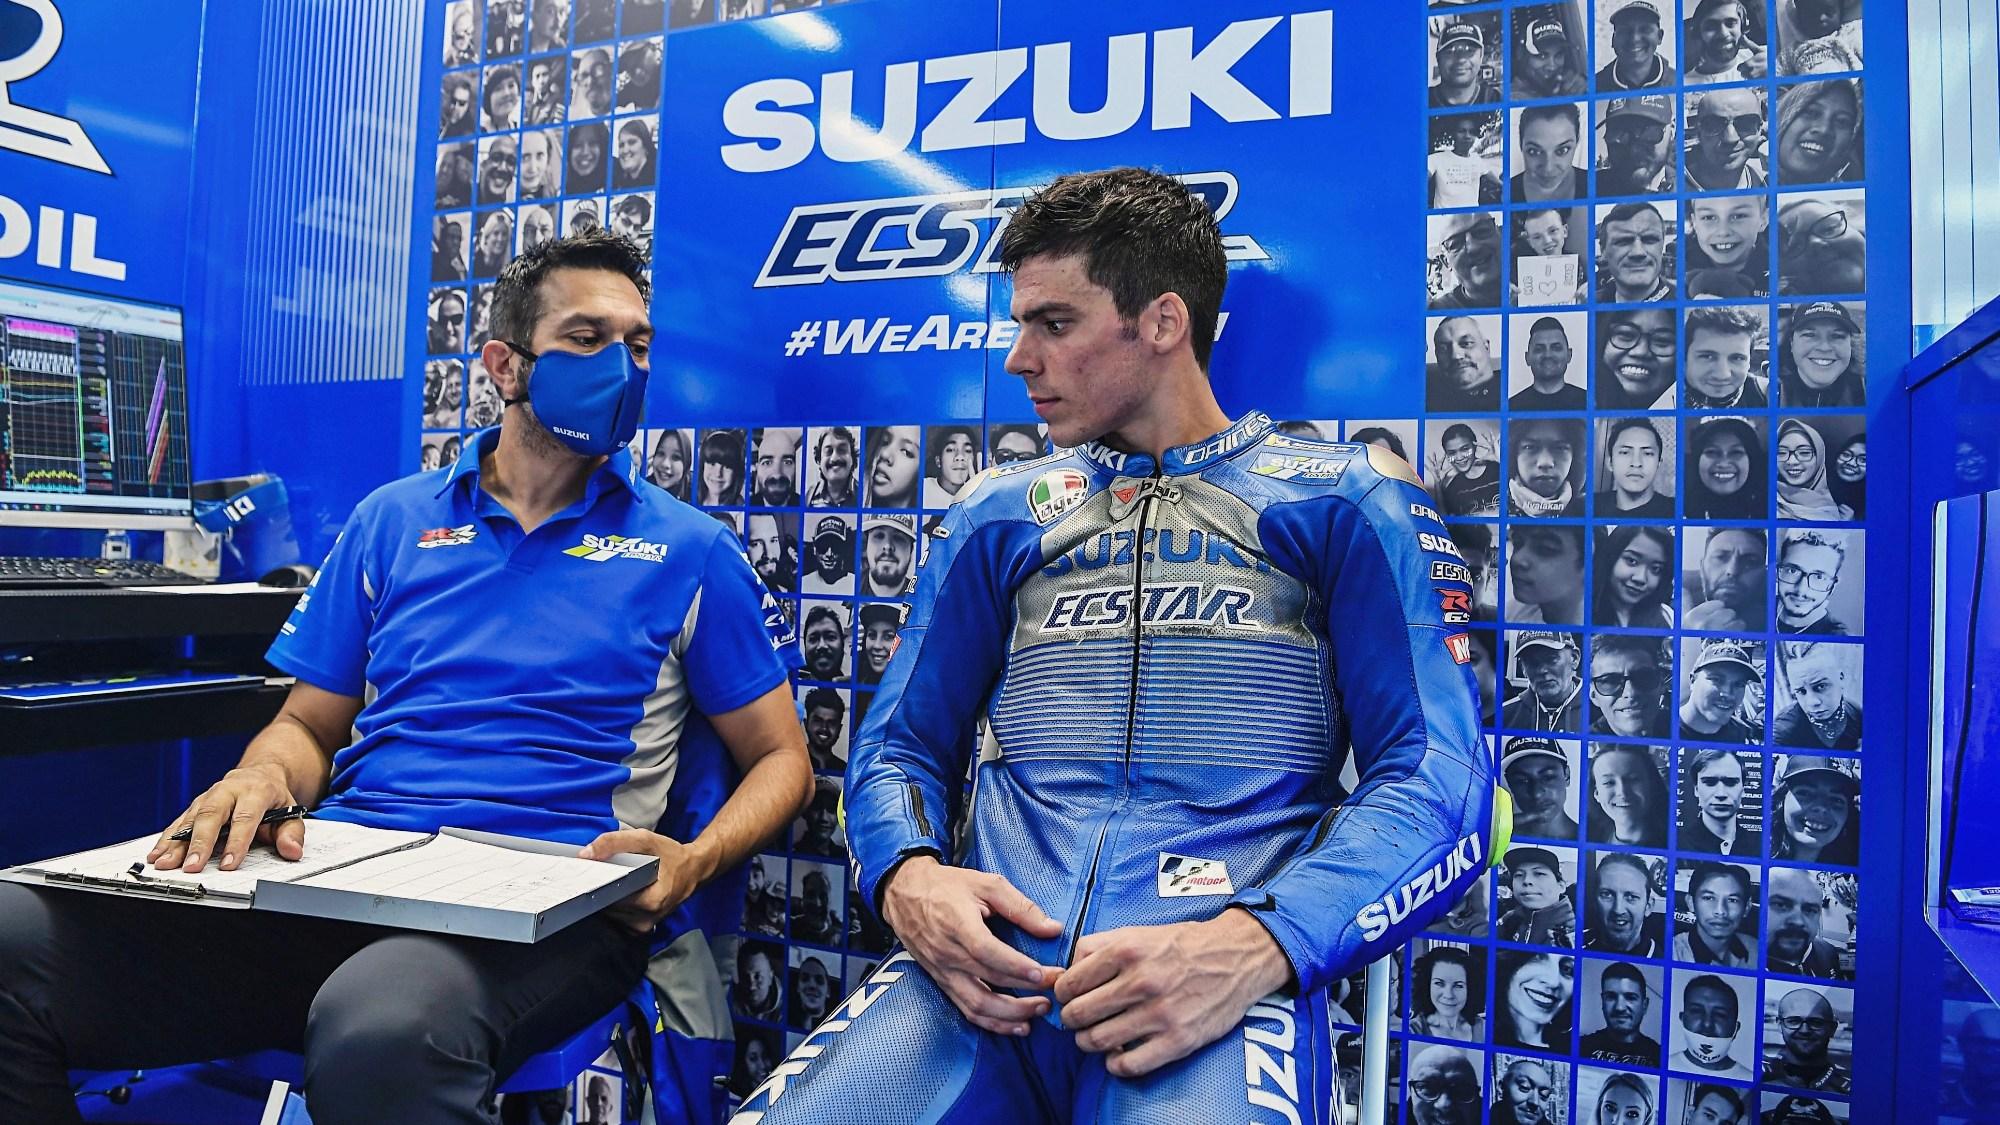 Joan Mir, Suzuki MotoGP 2020